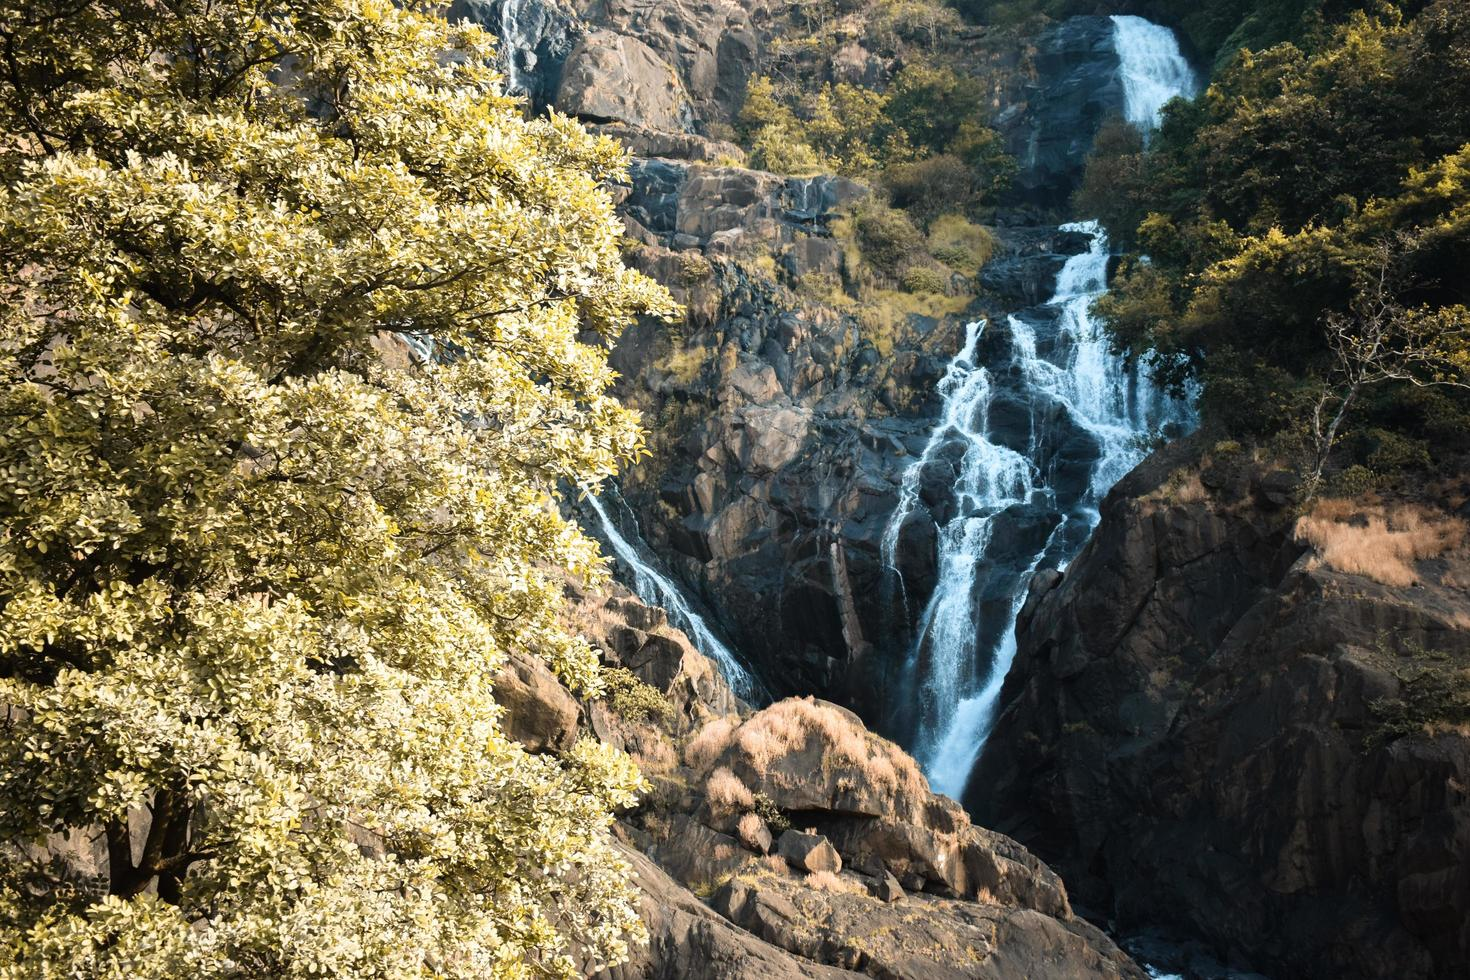 prachtige waterval afkomstig van de berg foto